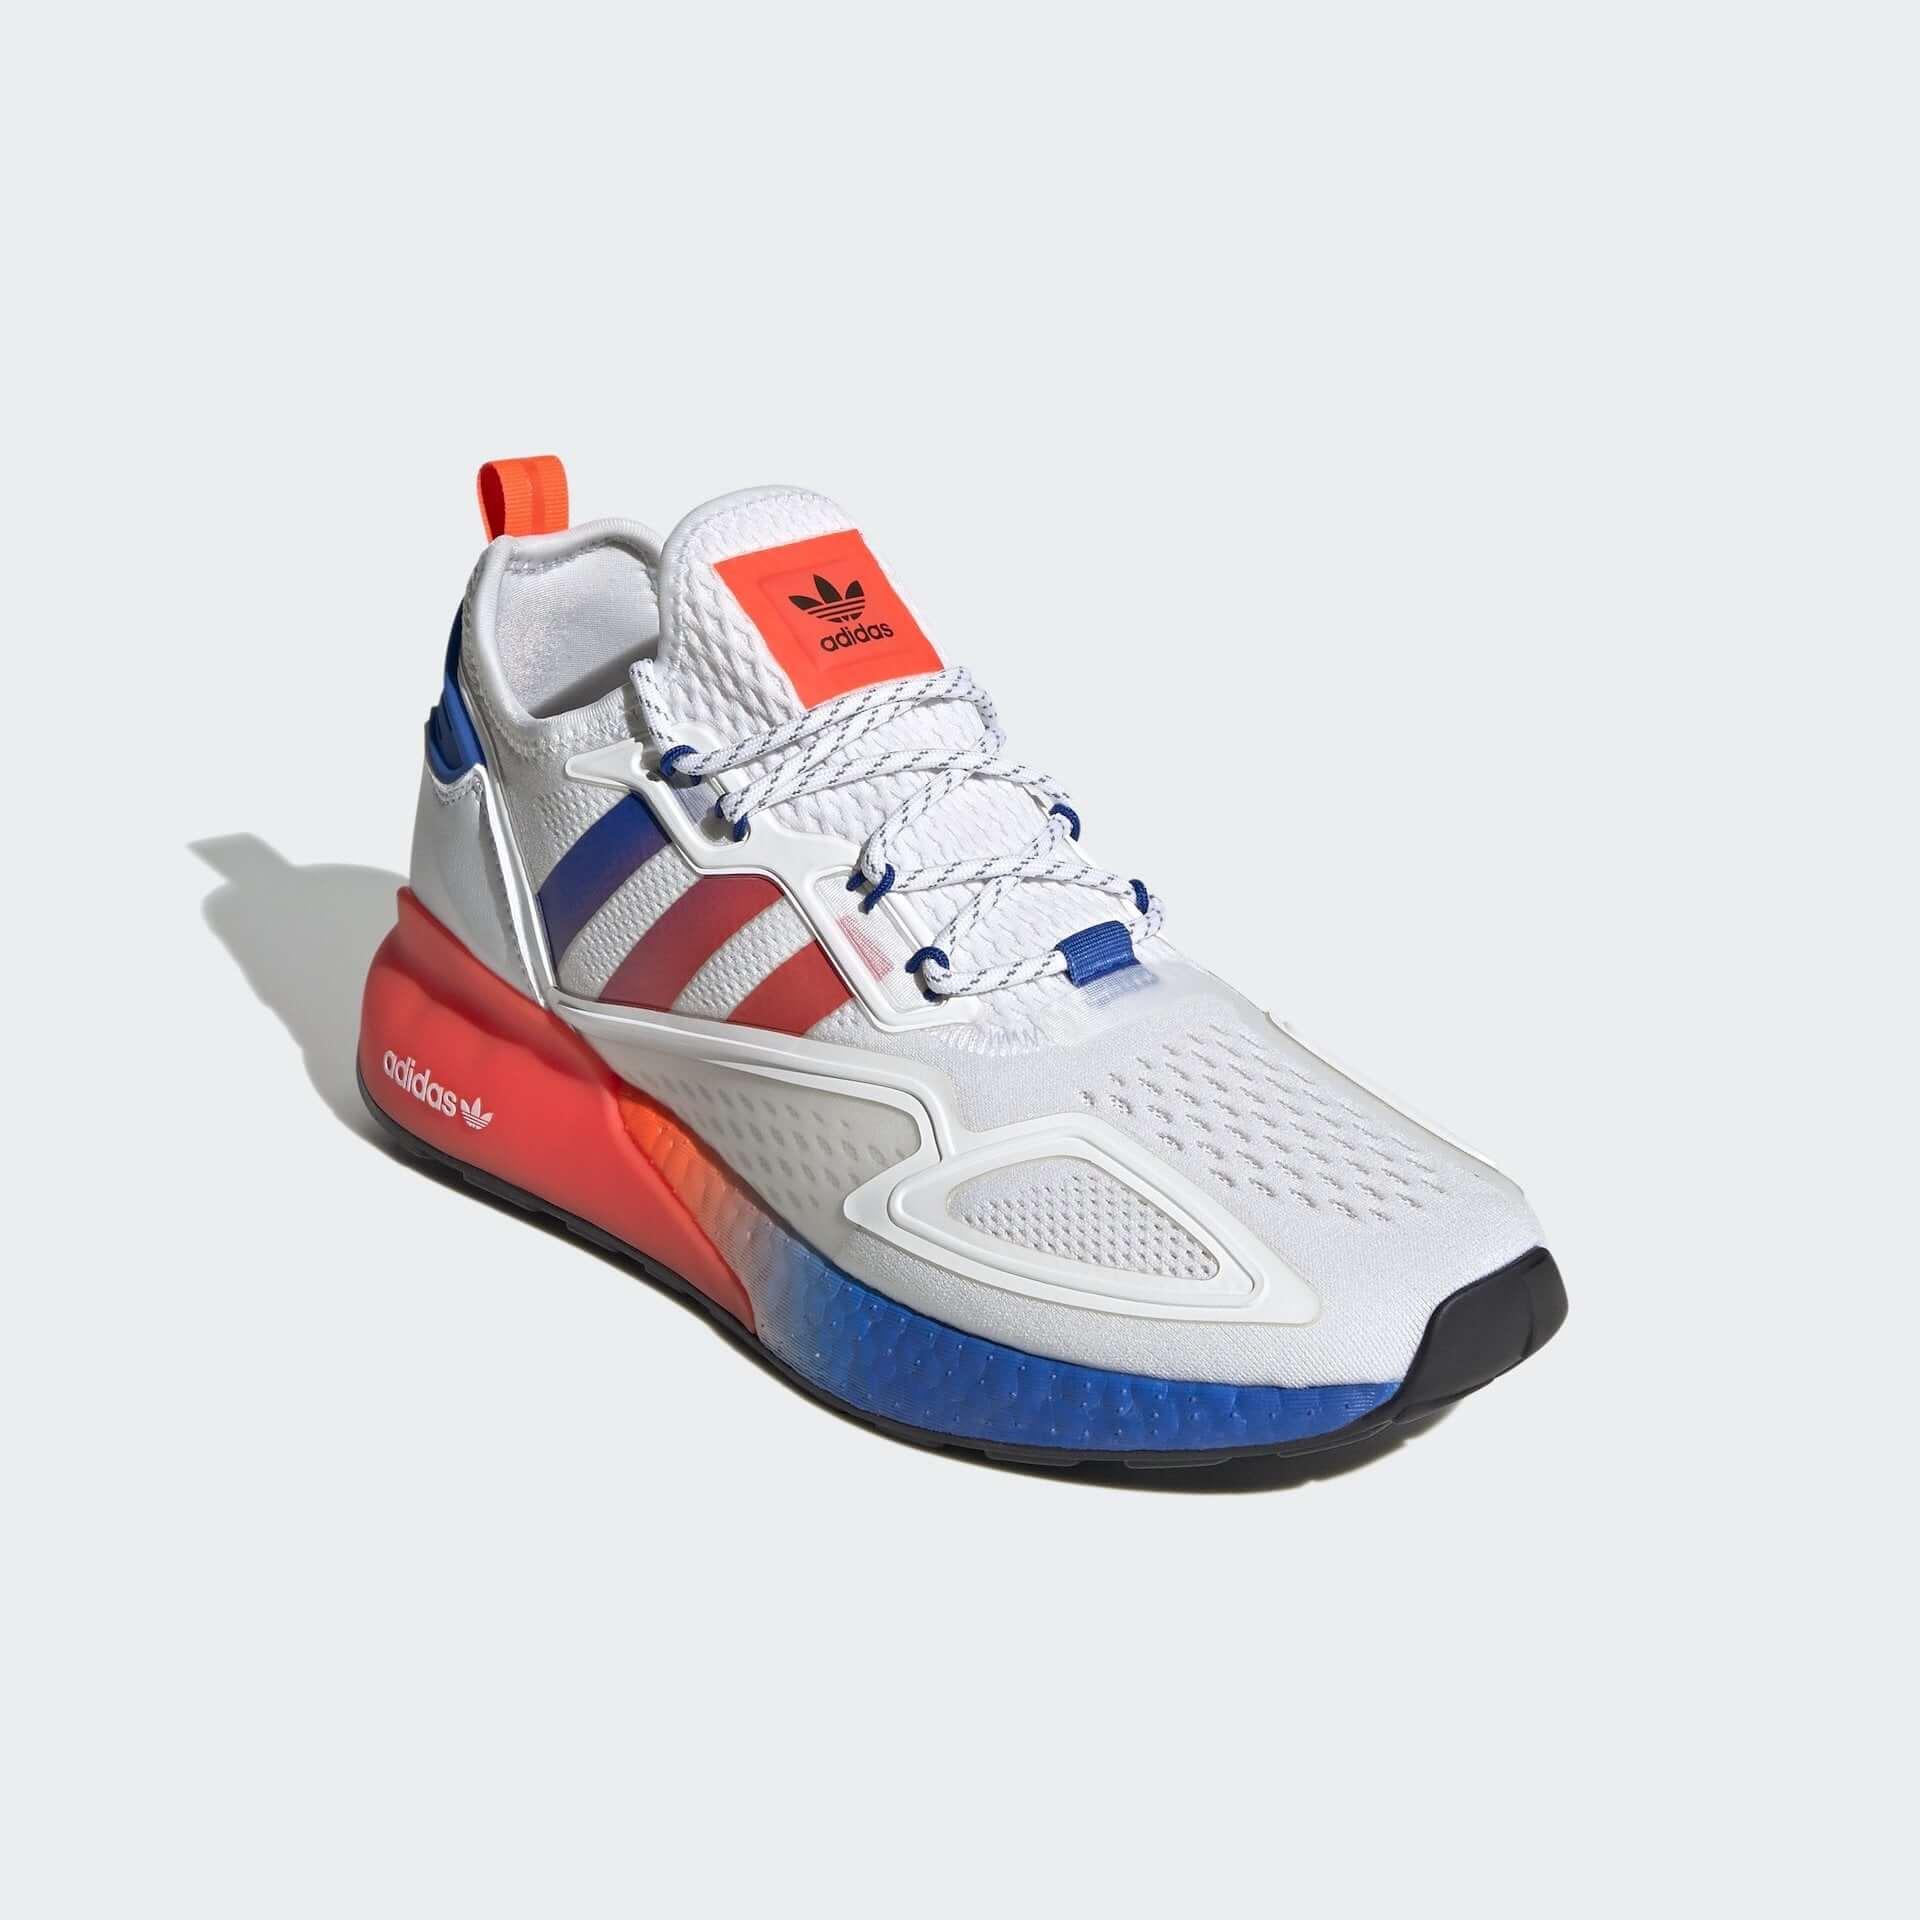 adidas Originalsの「ZX」シリーズから最新モデル『ZX 2K BOOST』が登場!レイザーラモンRG、アントニー出演のIGライブも開催決定 lf200817_adidas-zx_5-1920x1920